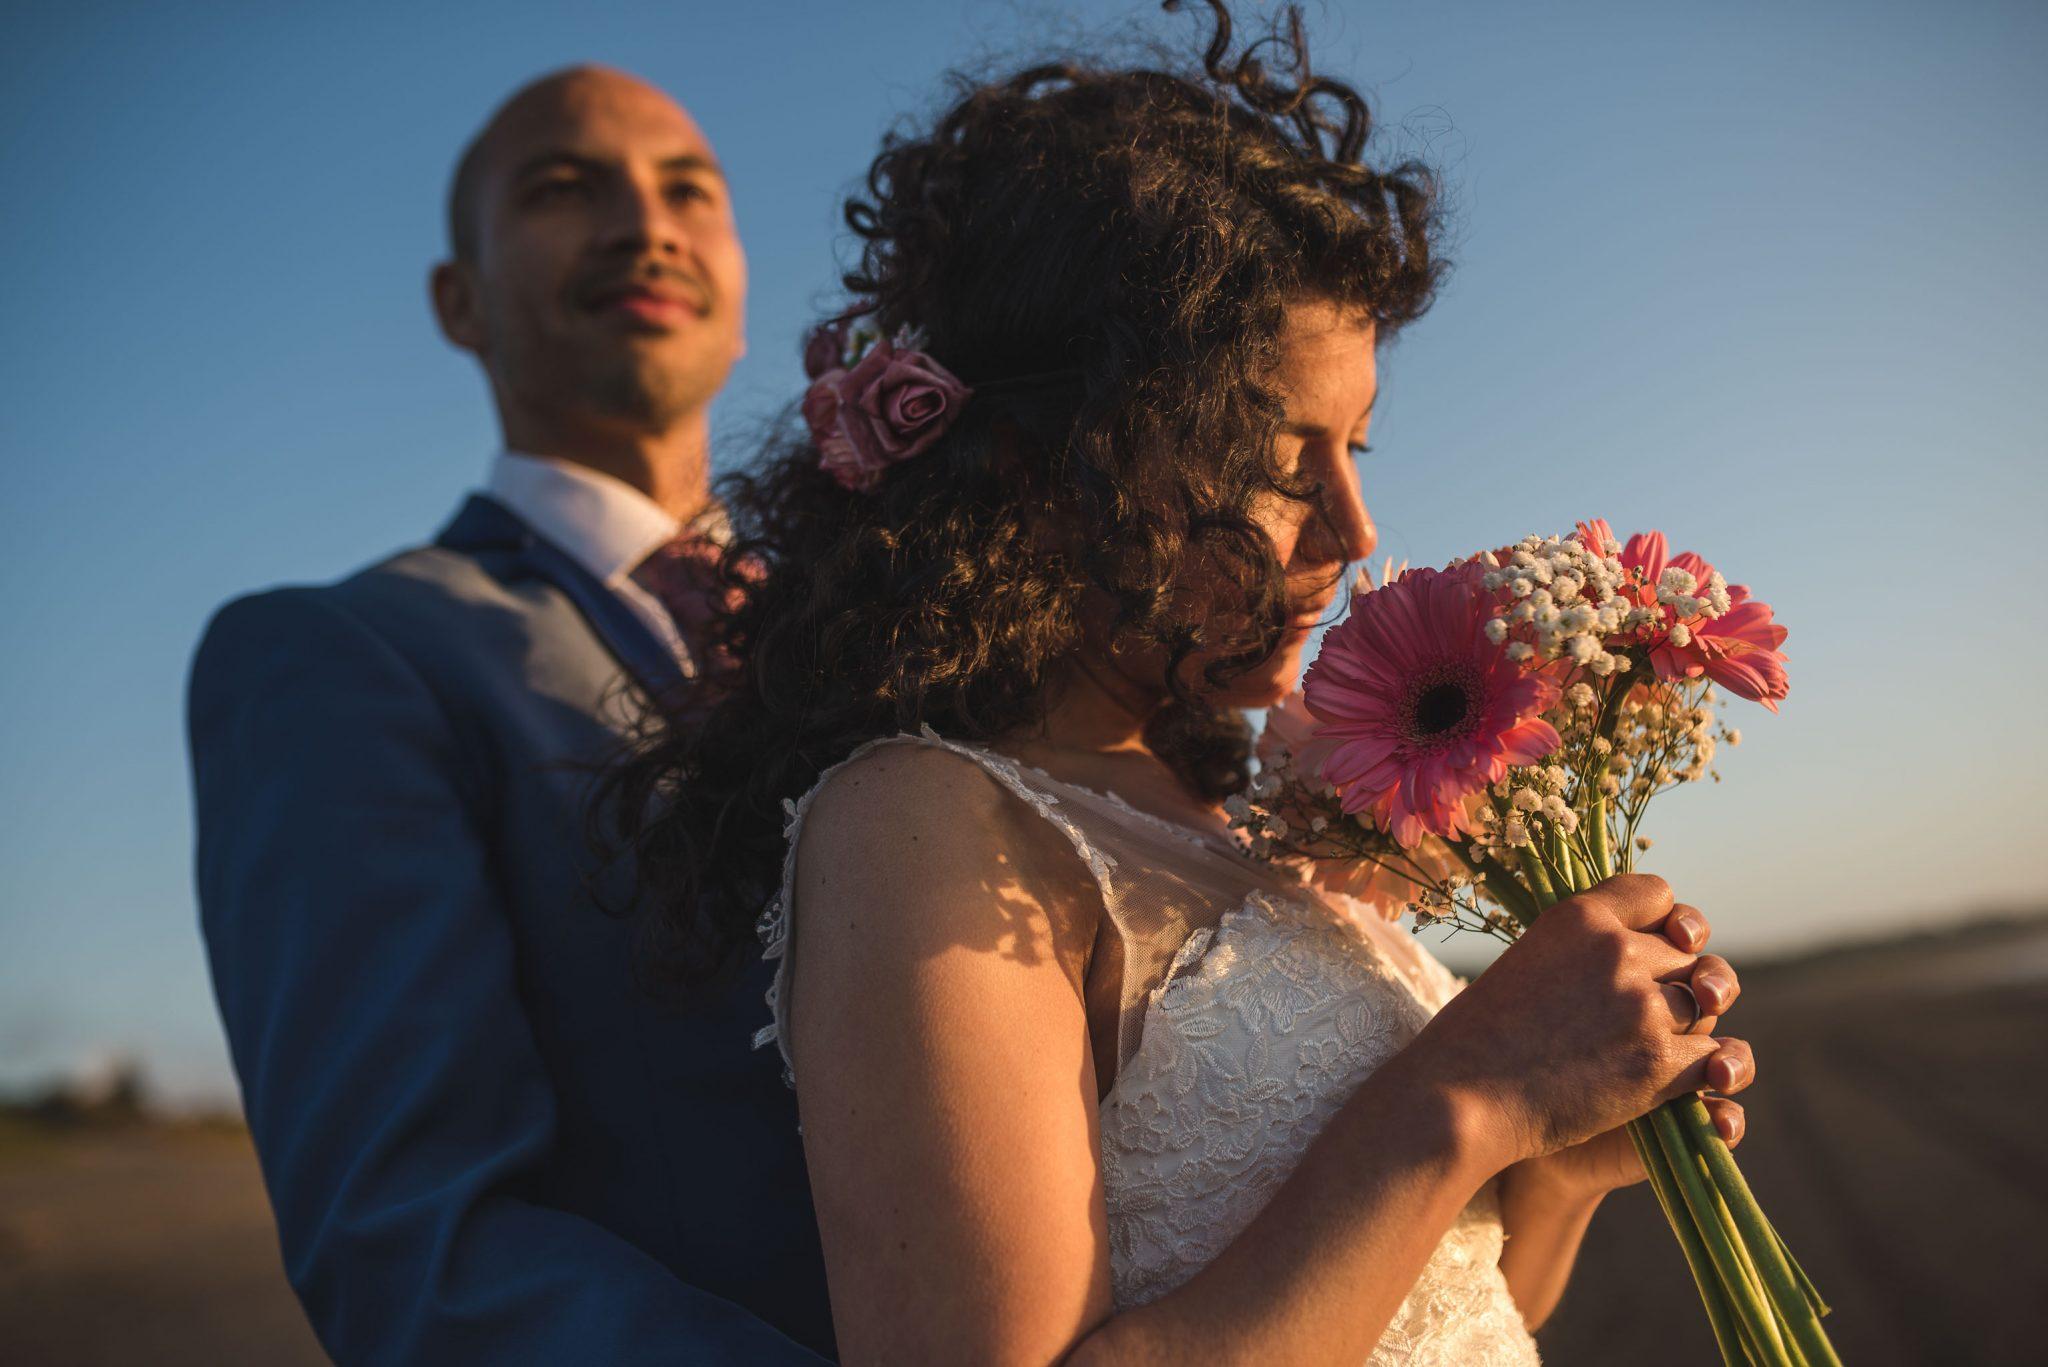 sesión-playa-trash the dress-pichilemu-fotografo-matrimonio-diego mena fotografia